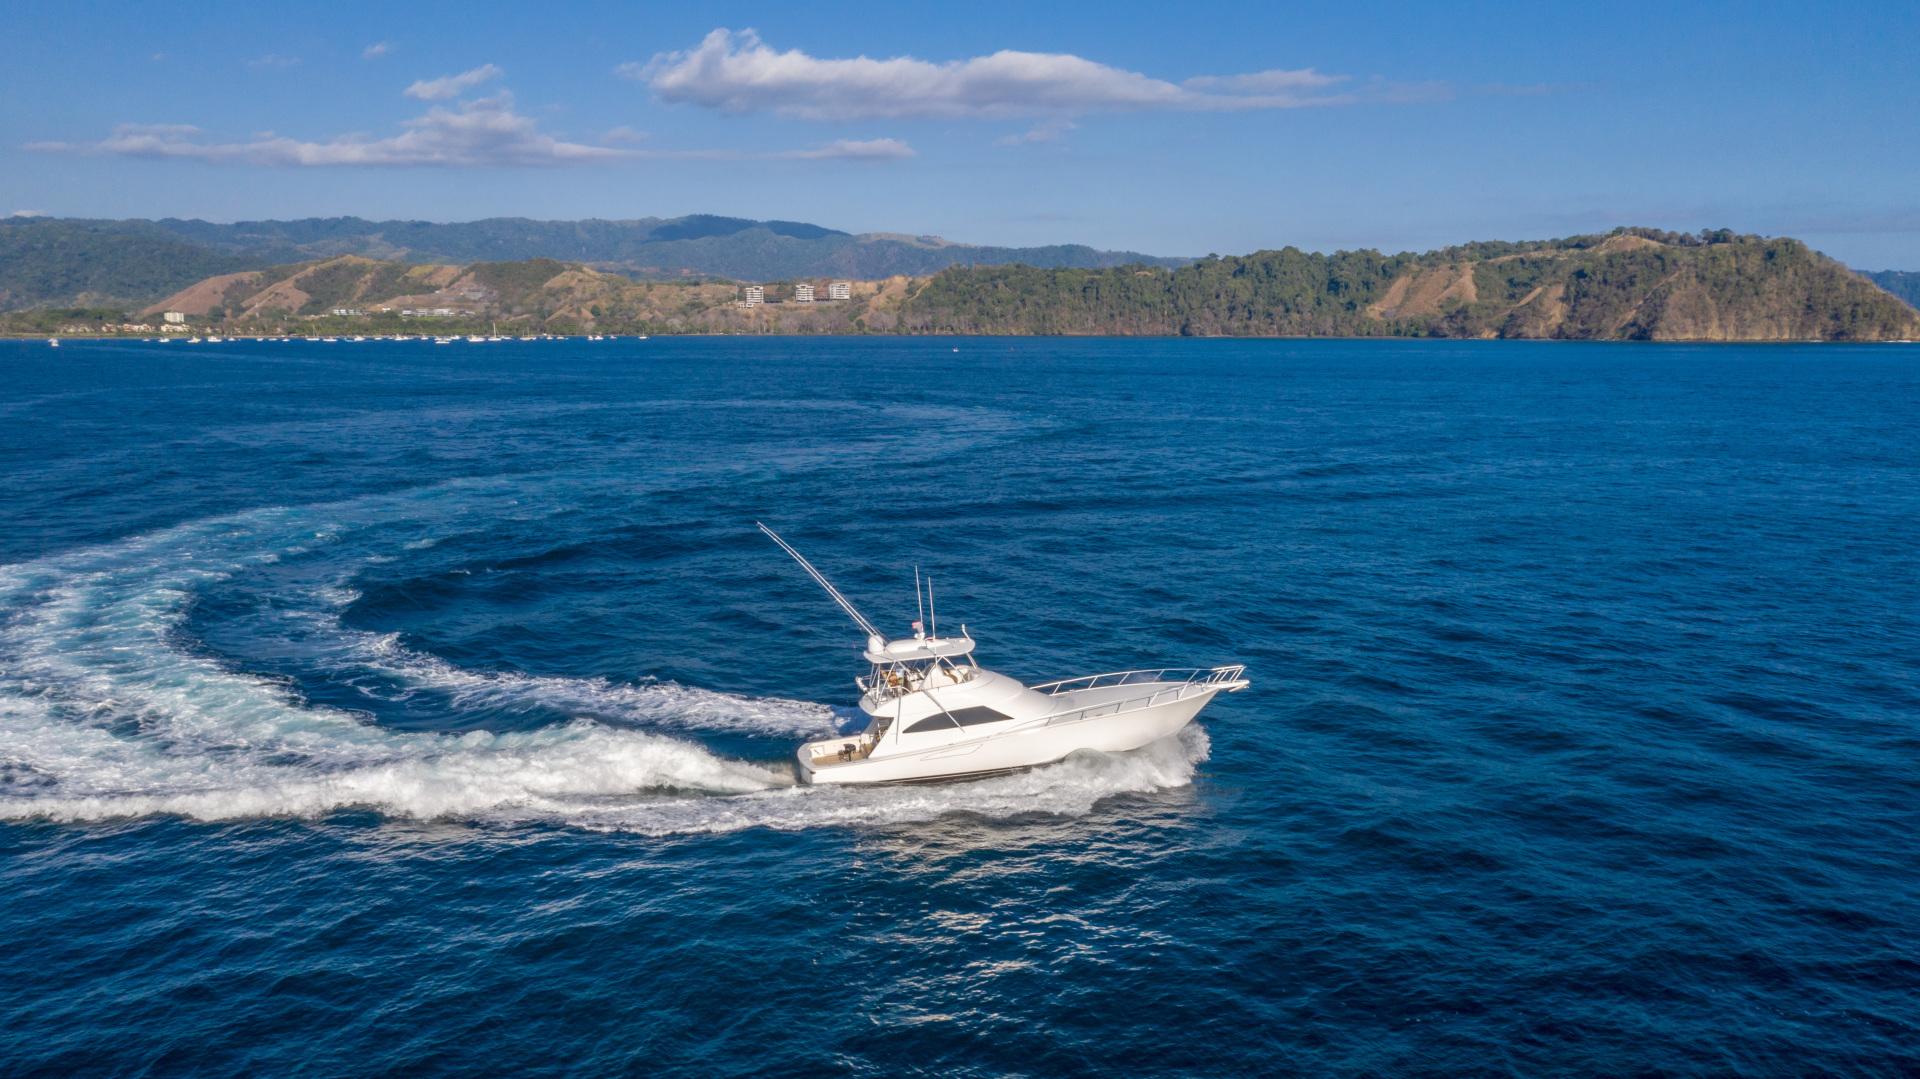 Viking-62 Convertible 2014-Mixer Playa Herradura, Los Suenos,-Costa Rica-2014 Viking 62 Convertible  Starboard Profile Running-1356284 | Thumbnail